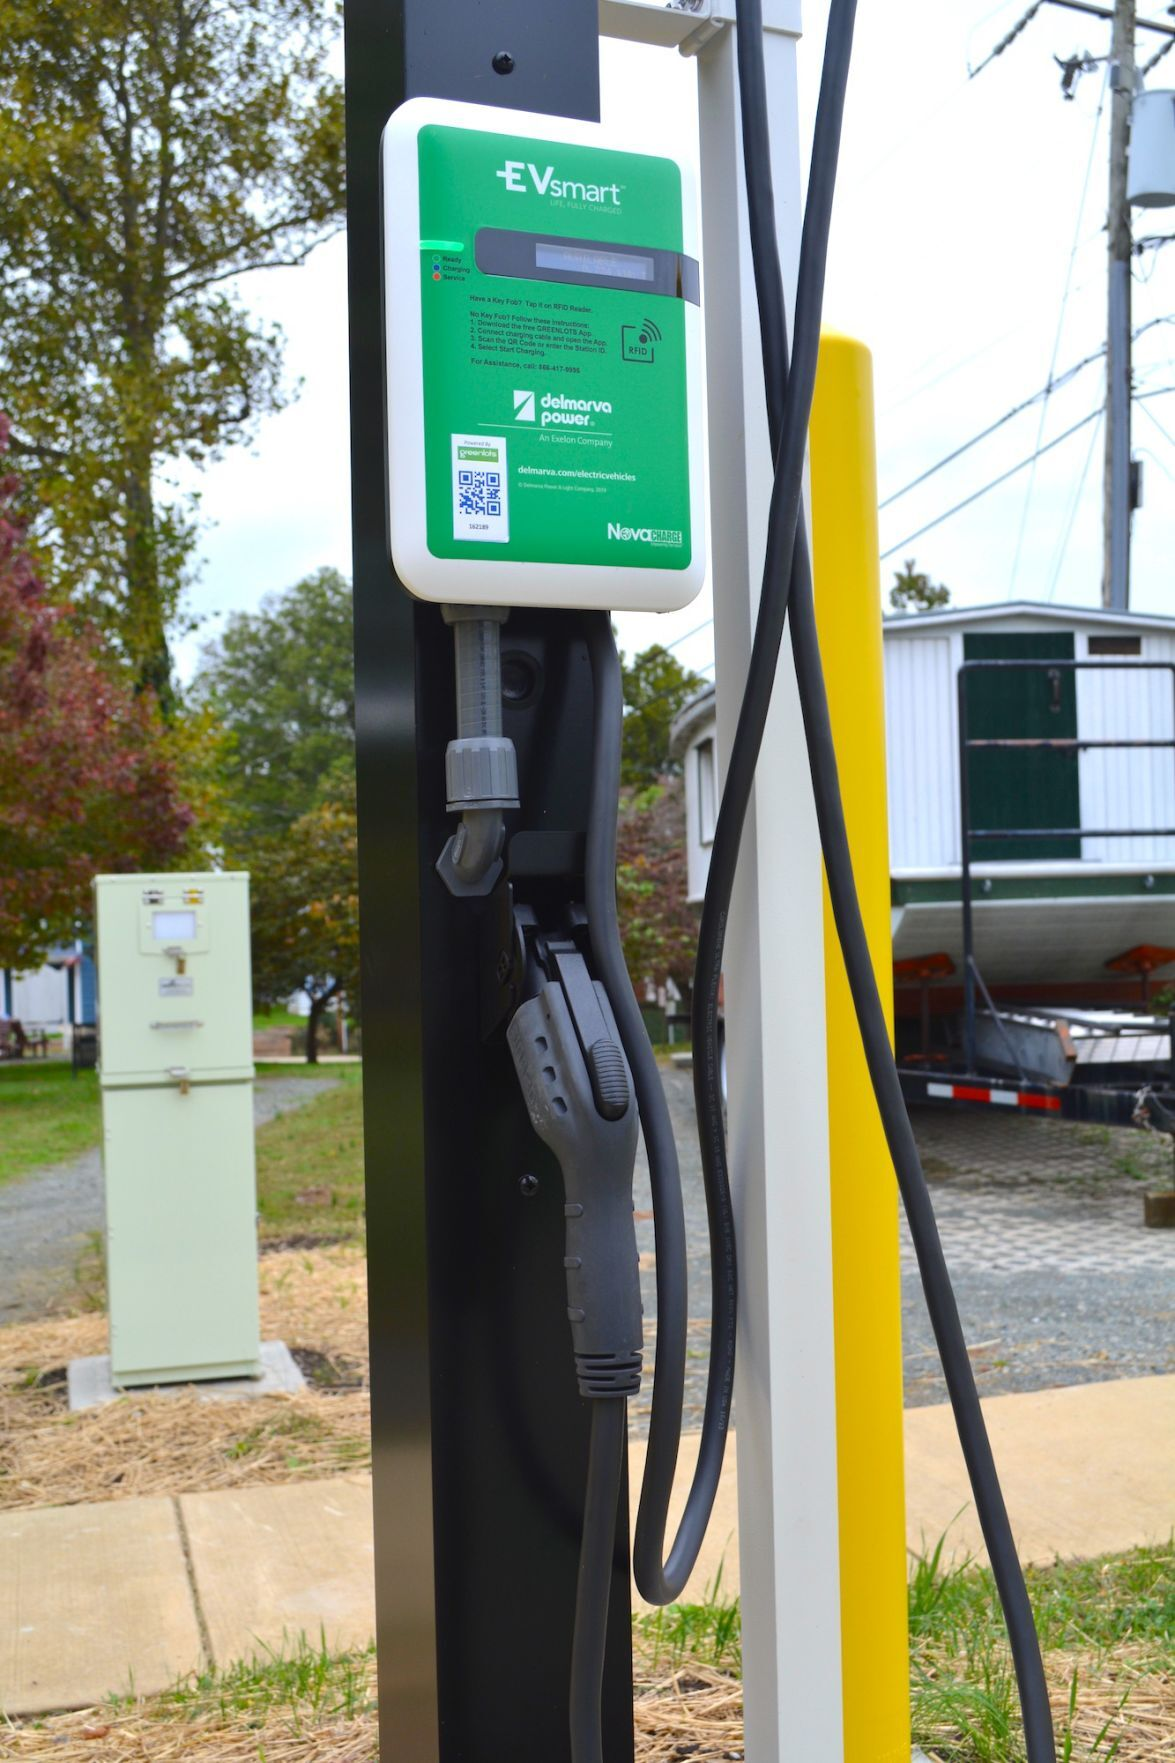 Betterton offers EV charging